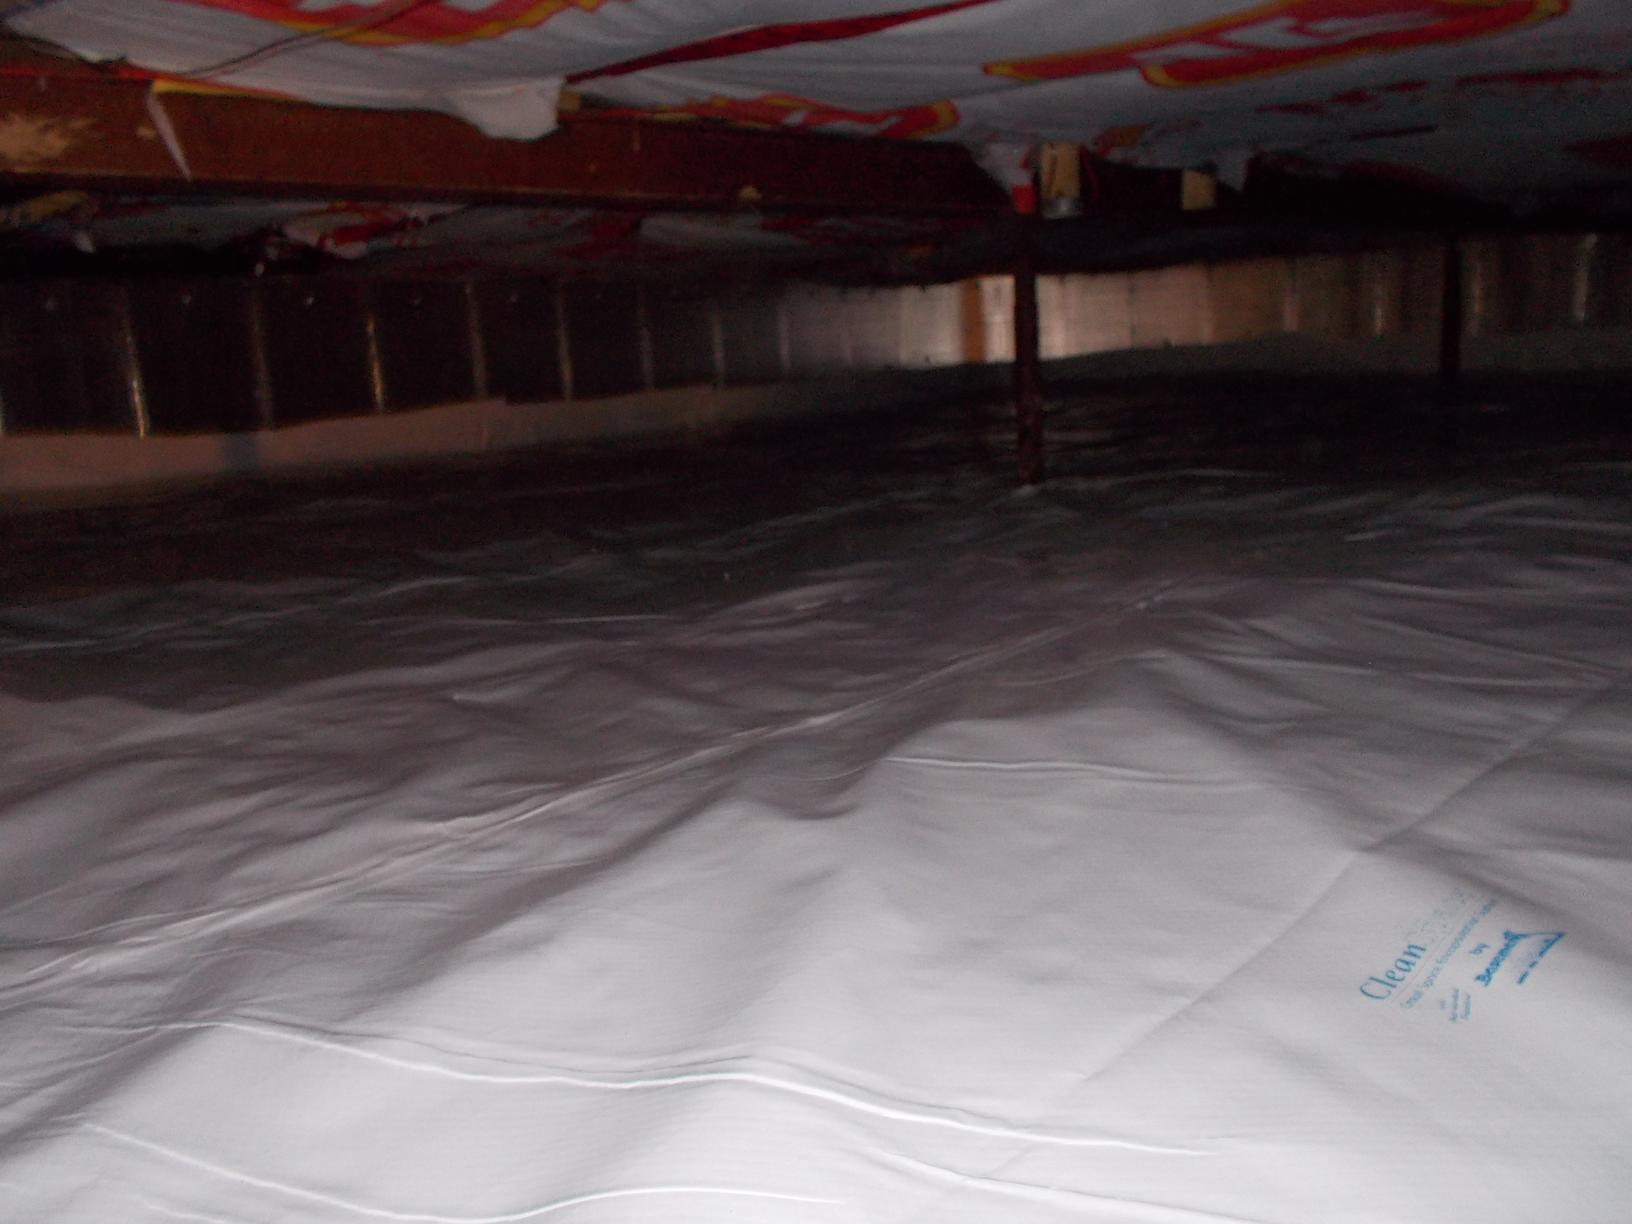 Damp Crawlspace Overhaul in Delhi - After Photo